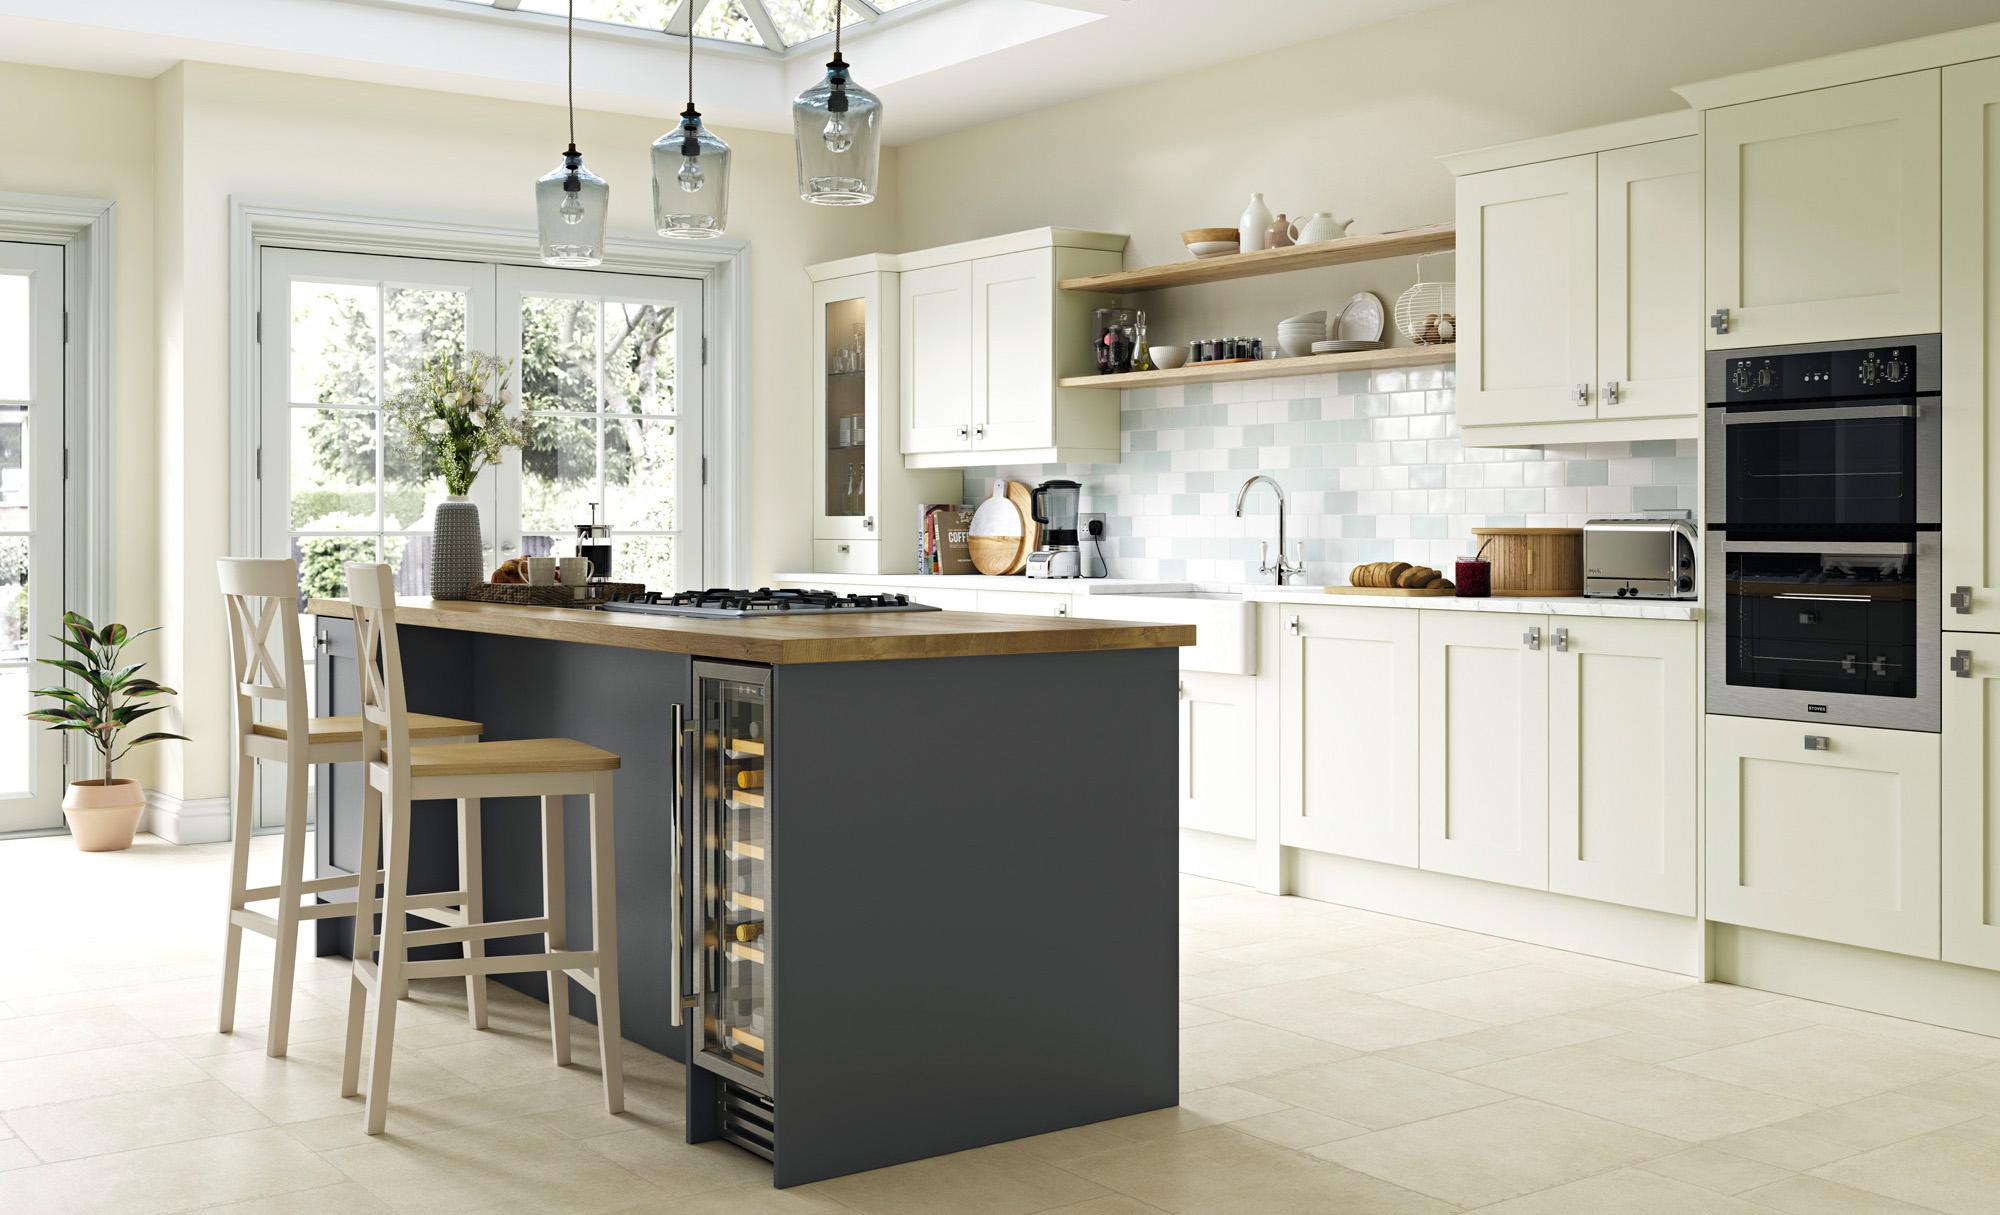 Classic Traditional Kitchen - Georgia Porcelain, Graphite - Kitchen Design - Alan Kelly Kitchens - Waterford